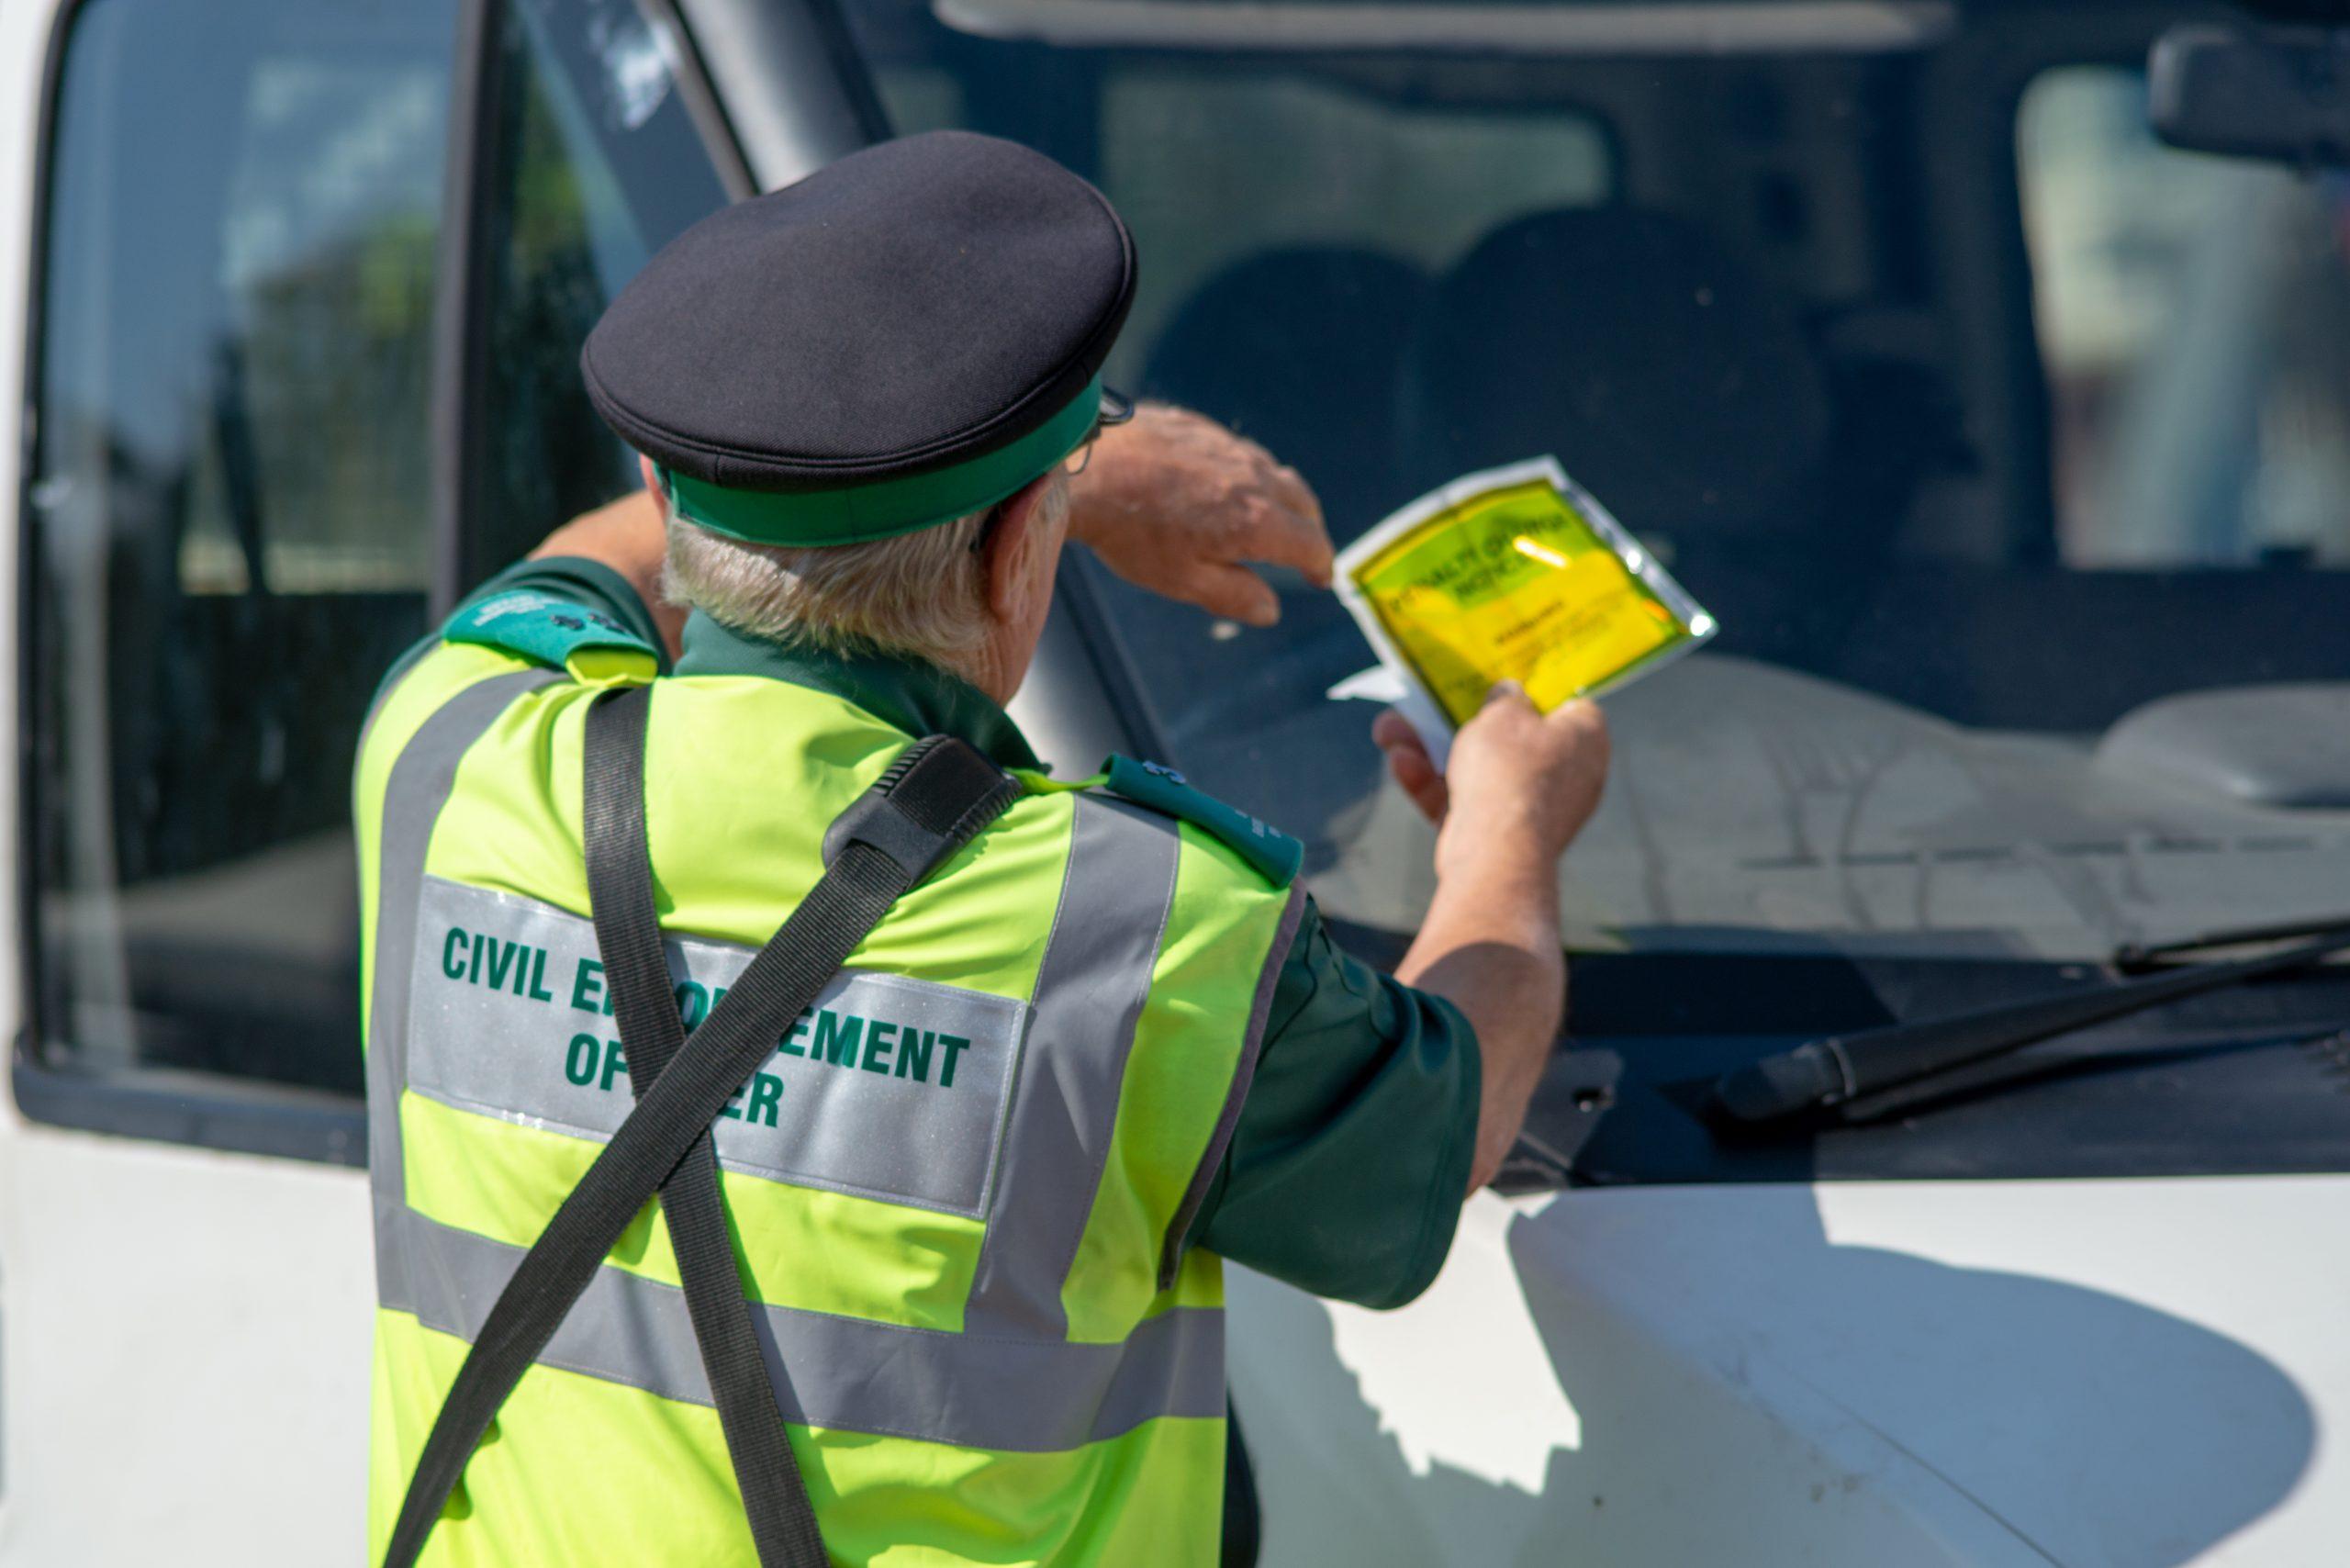 Warden gives parking fine to van